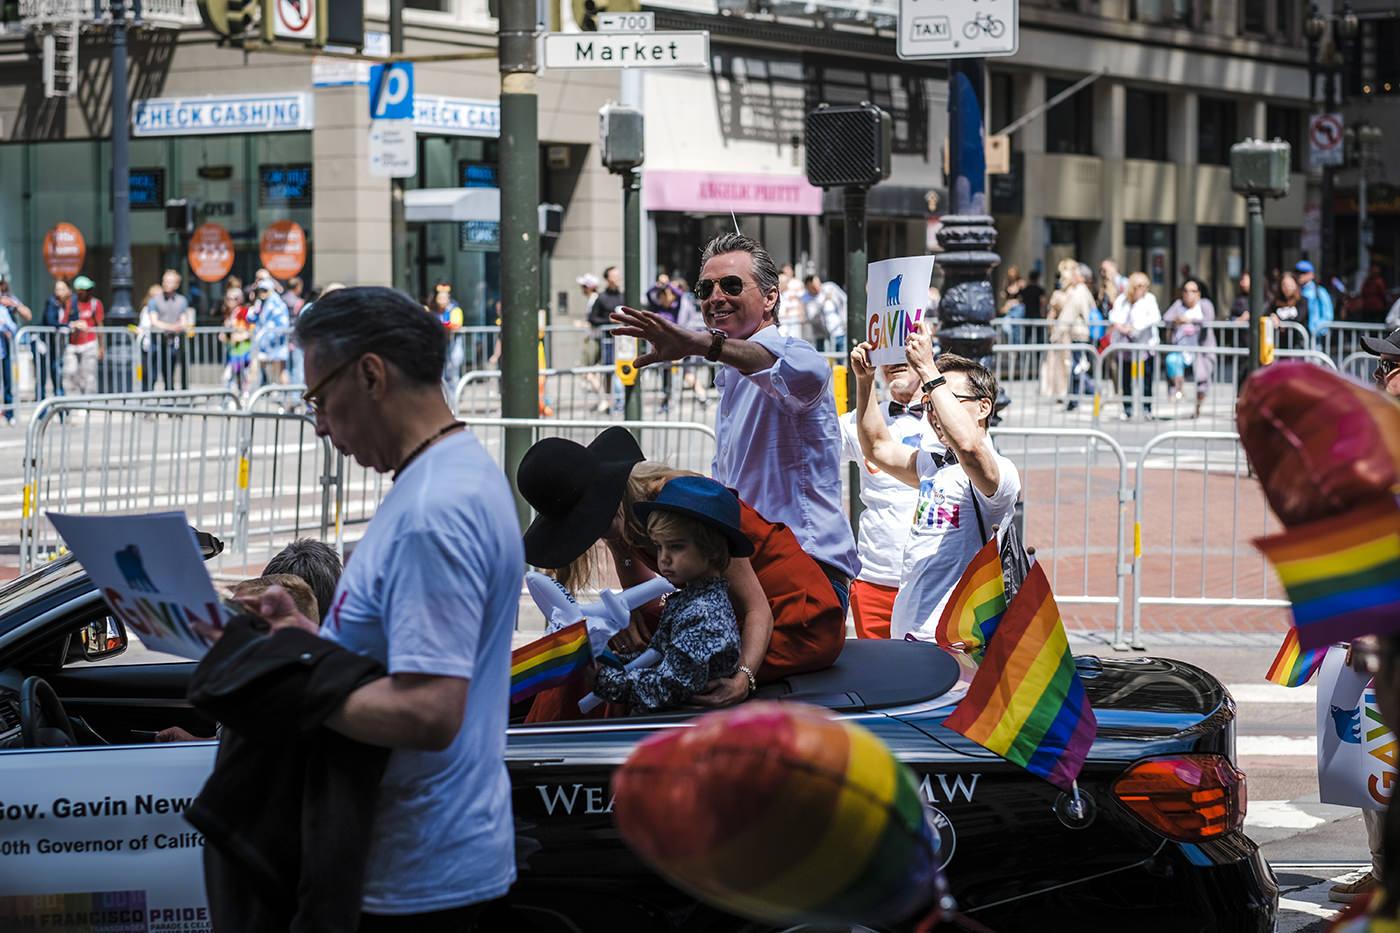 sf-pride-david-mullin-24.jpg